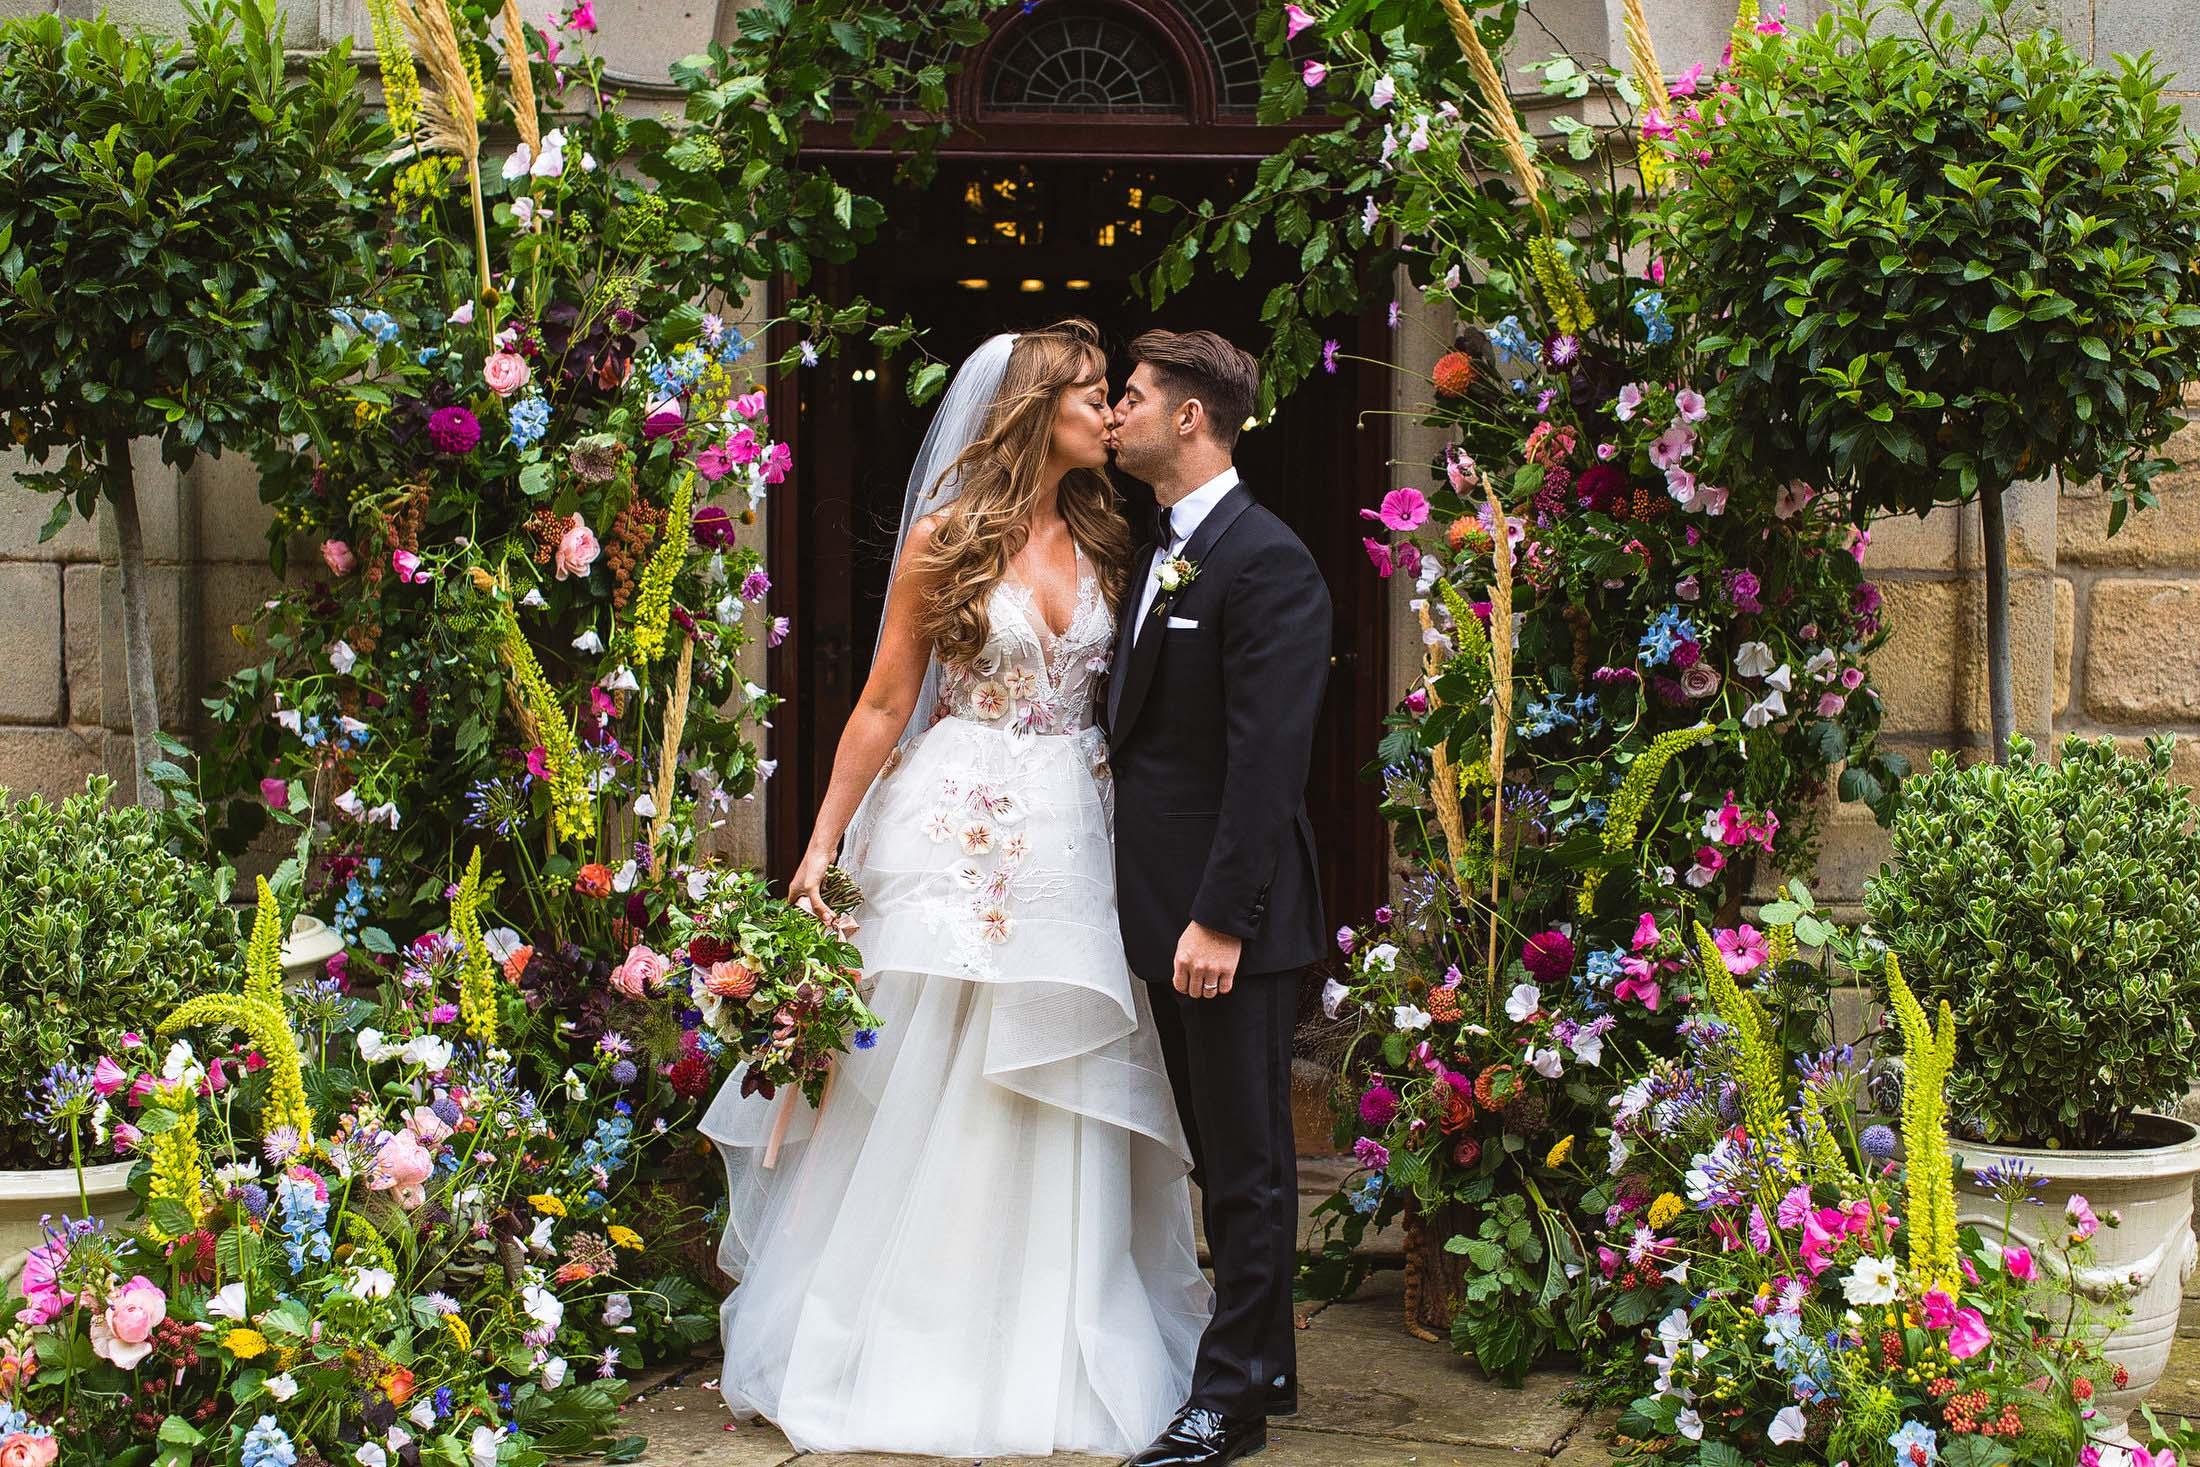 floral arch weddings